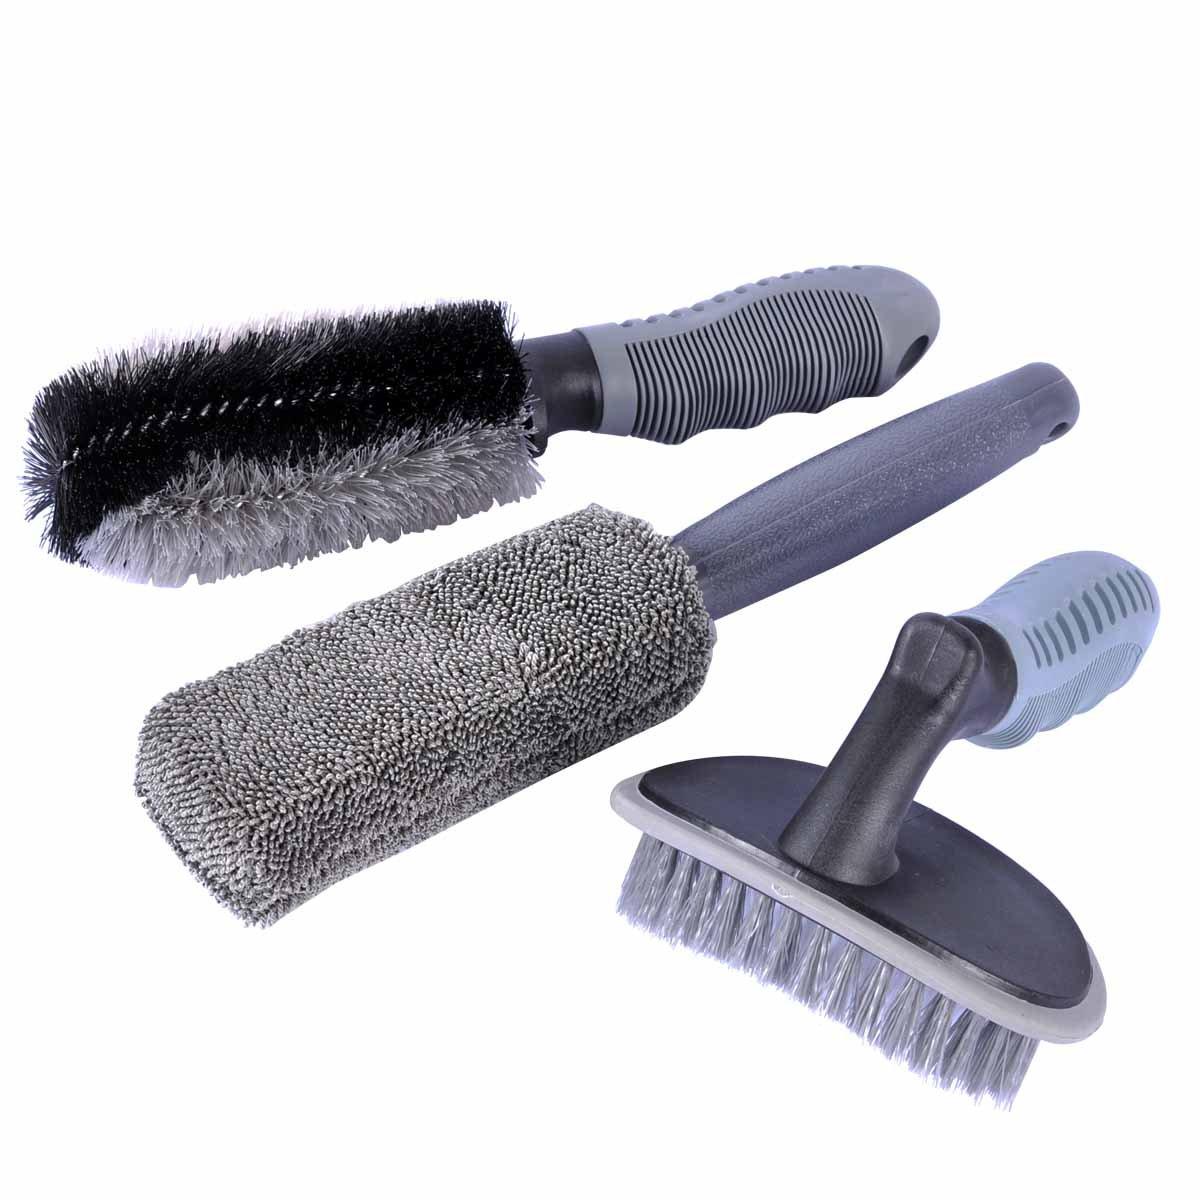 Car Wheel Cleaning Brush Kit, AutoEC 2 Tire Rim Scrub Brush Soft Alloy Brush Cleaner, 1 Premium Metal-Free Wheel & Rim Brush, Use for Auto Motorcycle Bike Wheel Cleaning